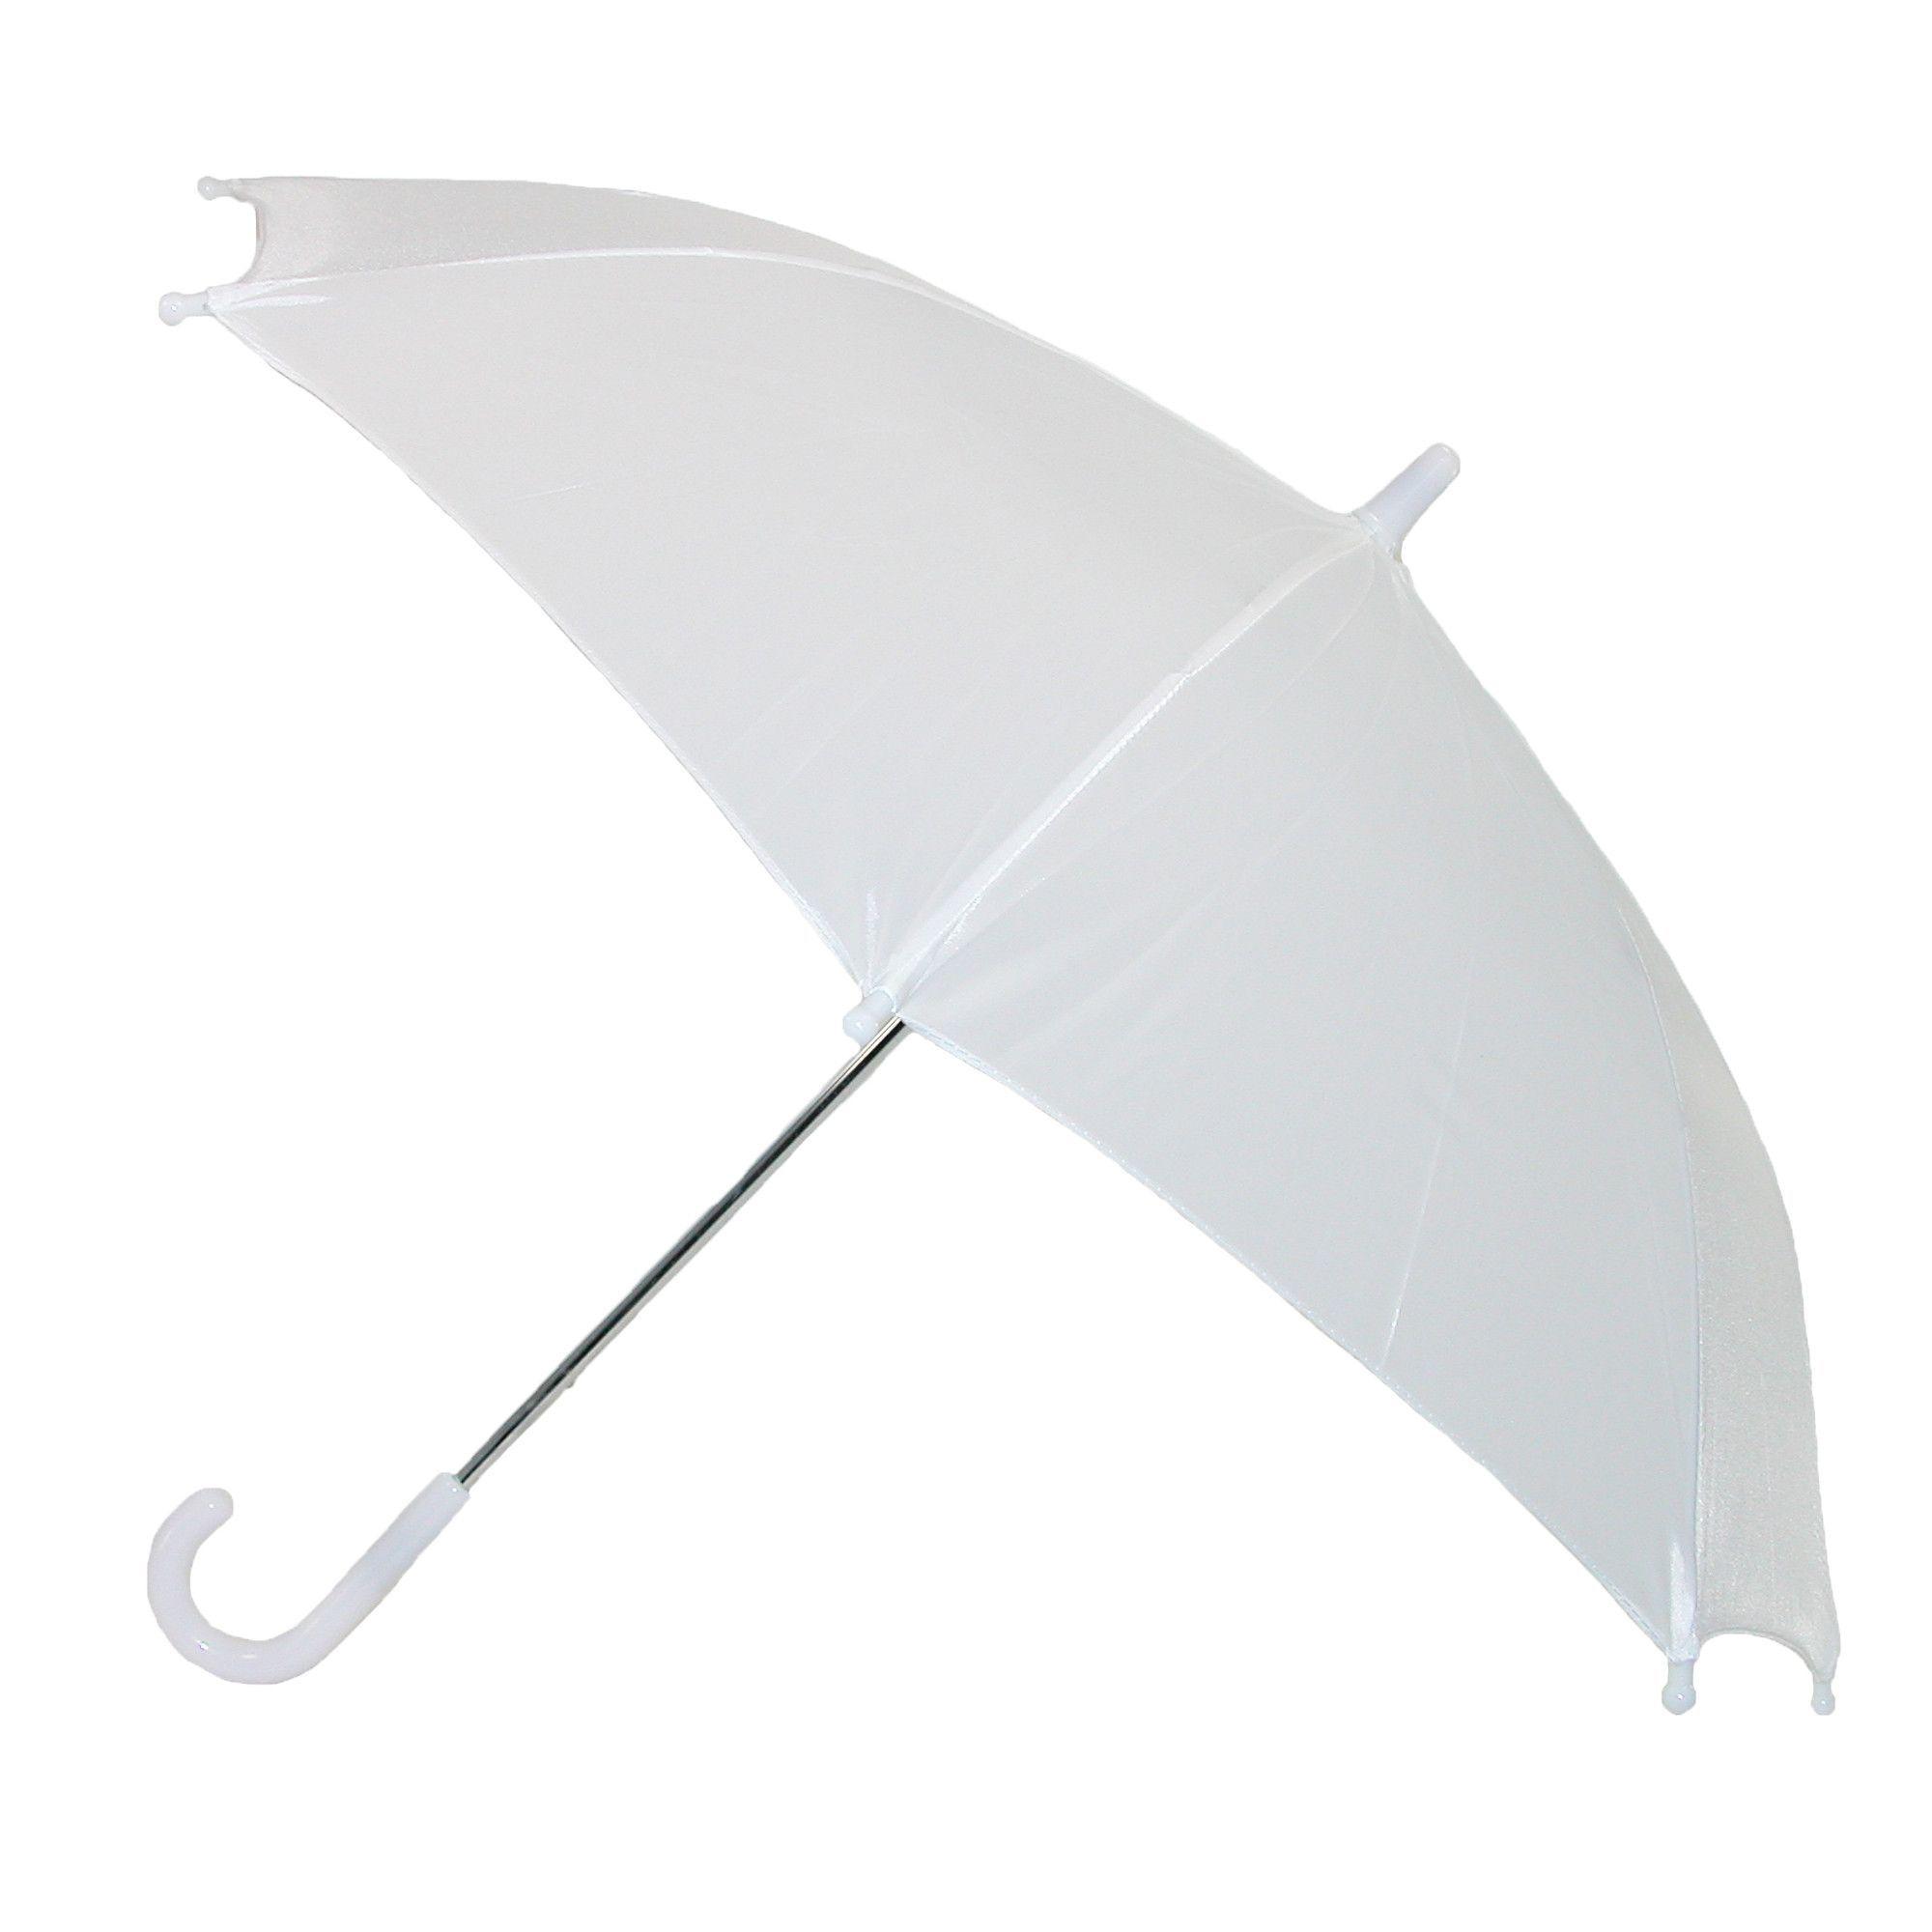 Black CTM Kids/' Solid Color Stick Umbrella